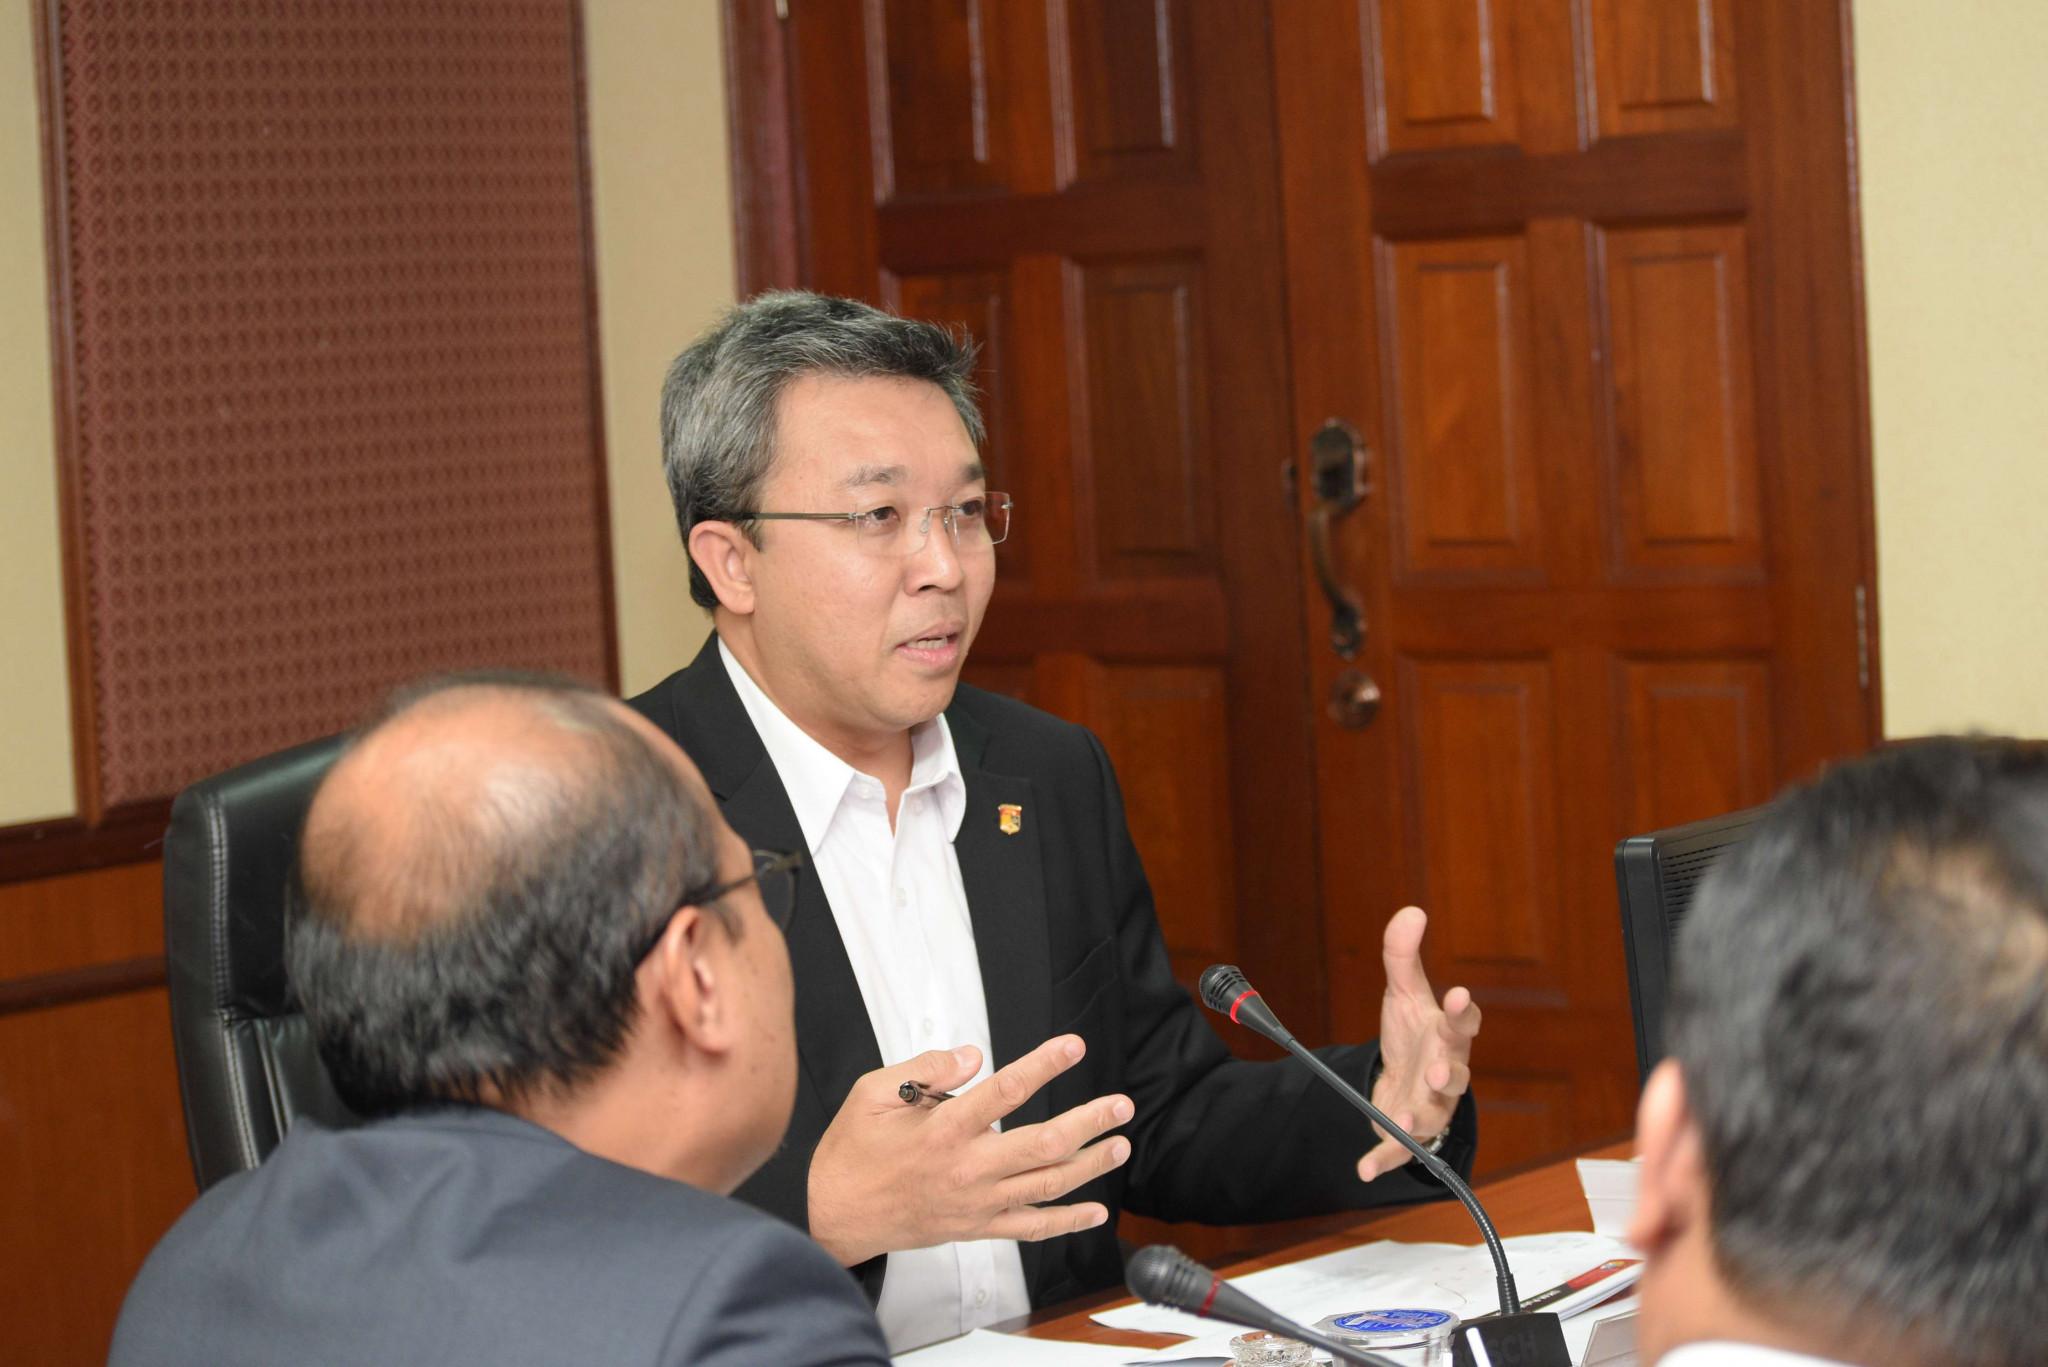 Visiting Vice Chancellor UKM To FEP Prof Ir Dr Mohd Hamdi Abd